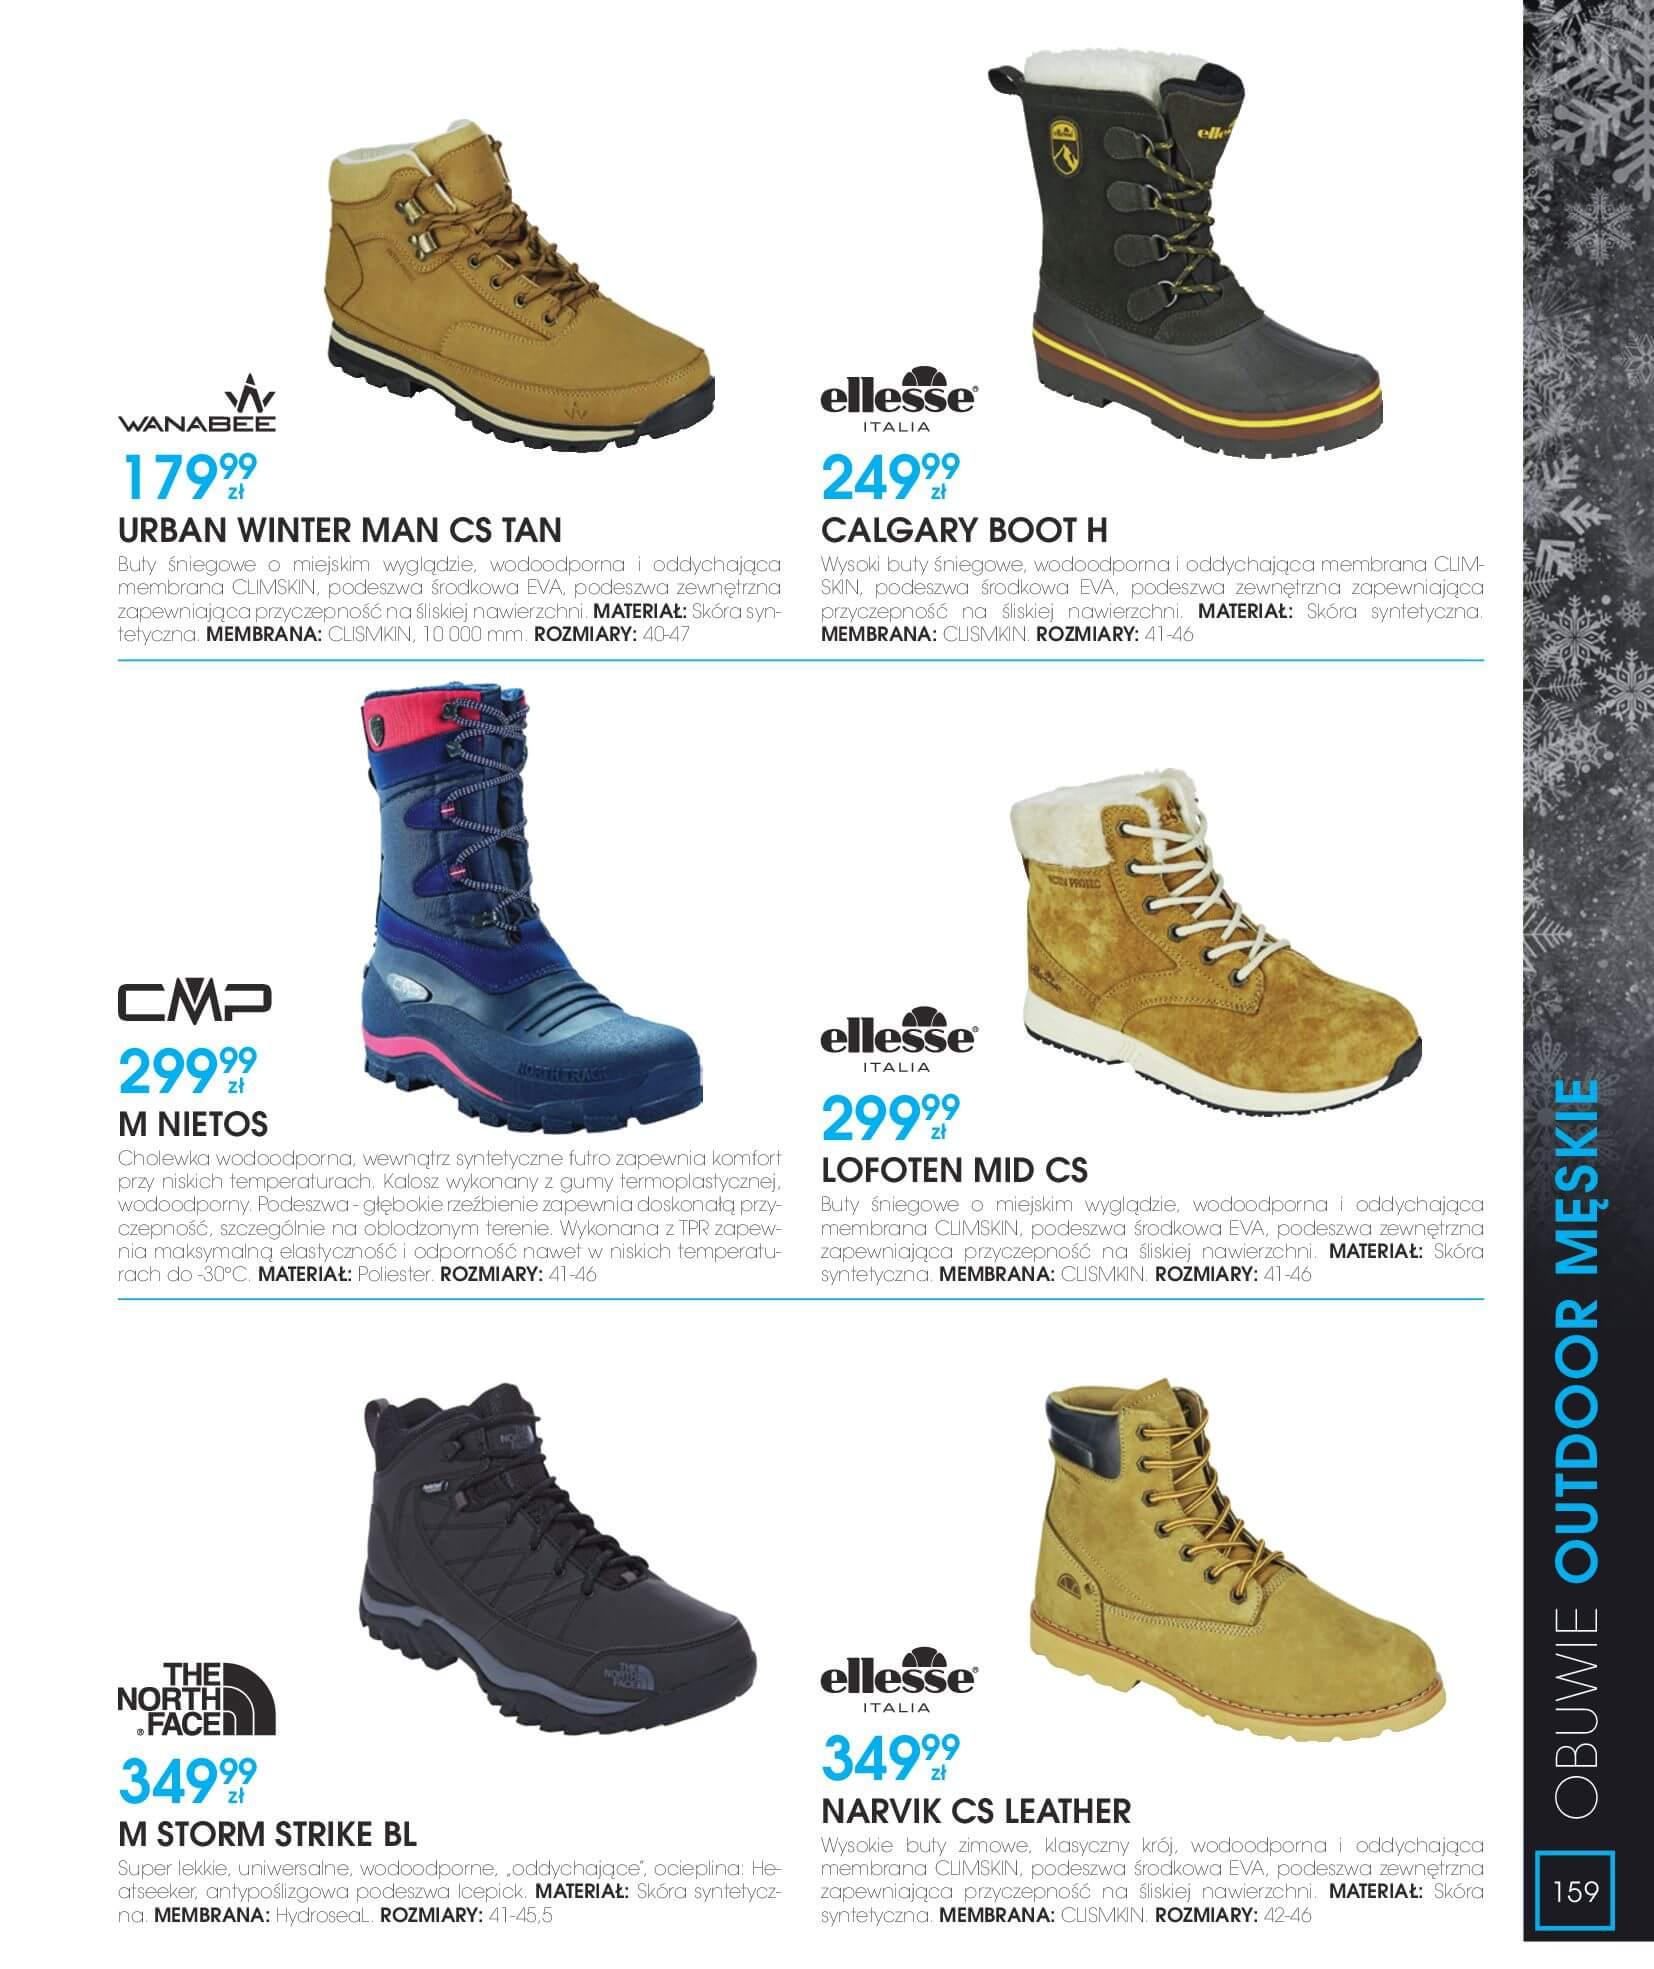 Gazetka Go Sport - Katalog Zima 2017/2018-12.11.2017-28.02.2018-page-159